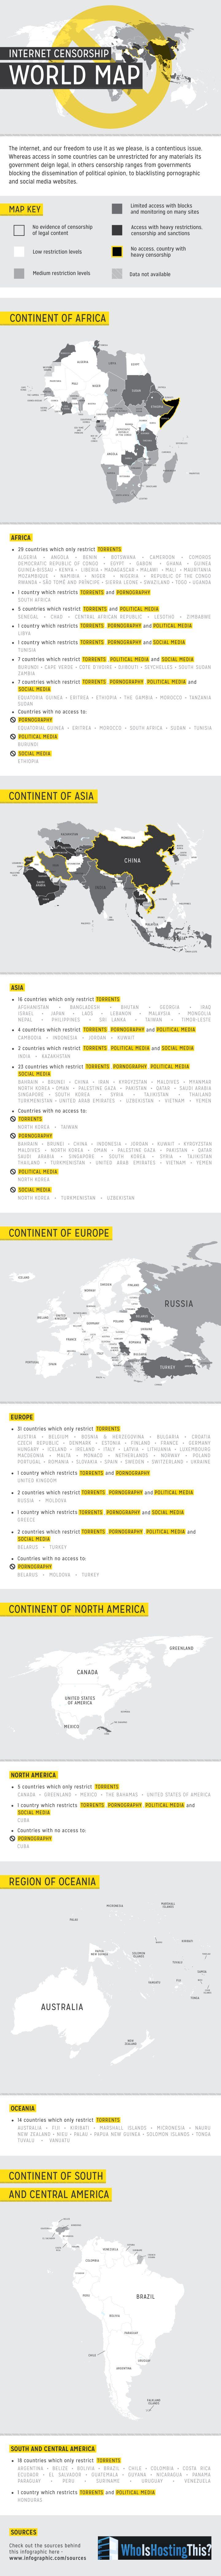 Internet Censorship World Map  #infographic #Censorship #Internet